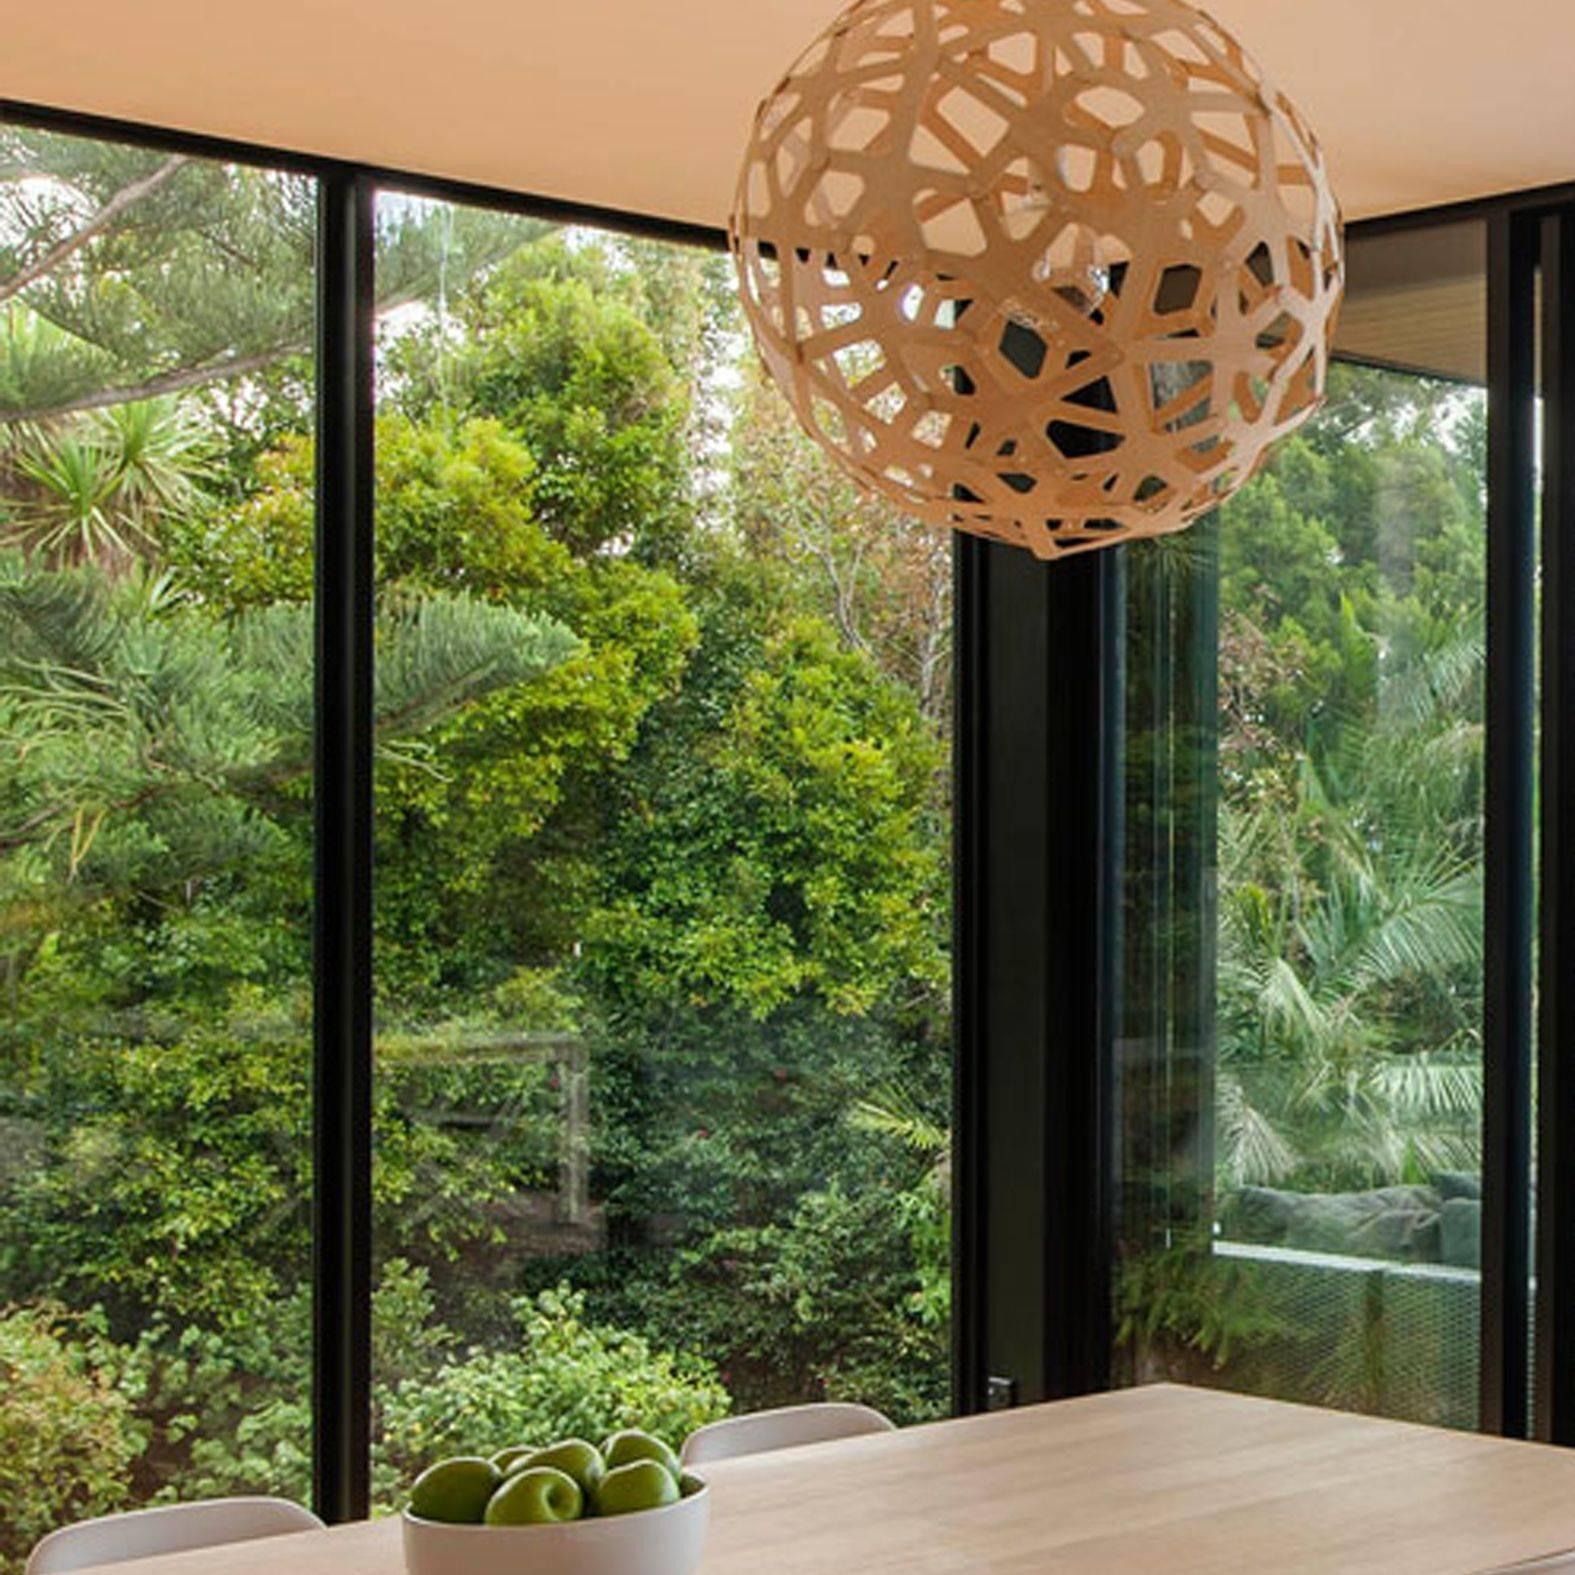 Wood Pendant Lights Design David Trubridge – Coral, Floral, Kina Throughout Coral Pendant Lights (View 15 of 15)